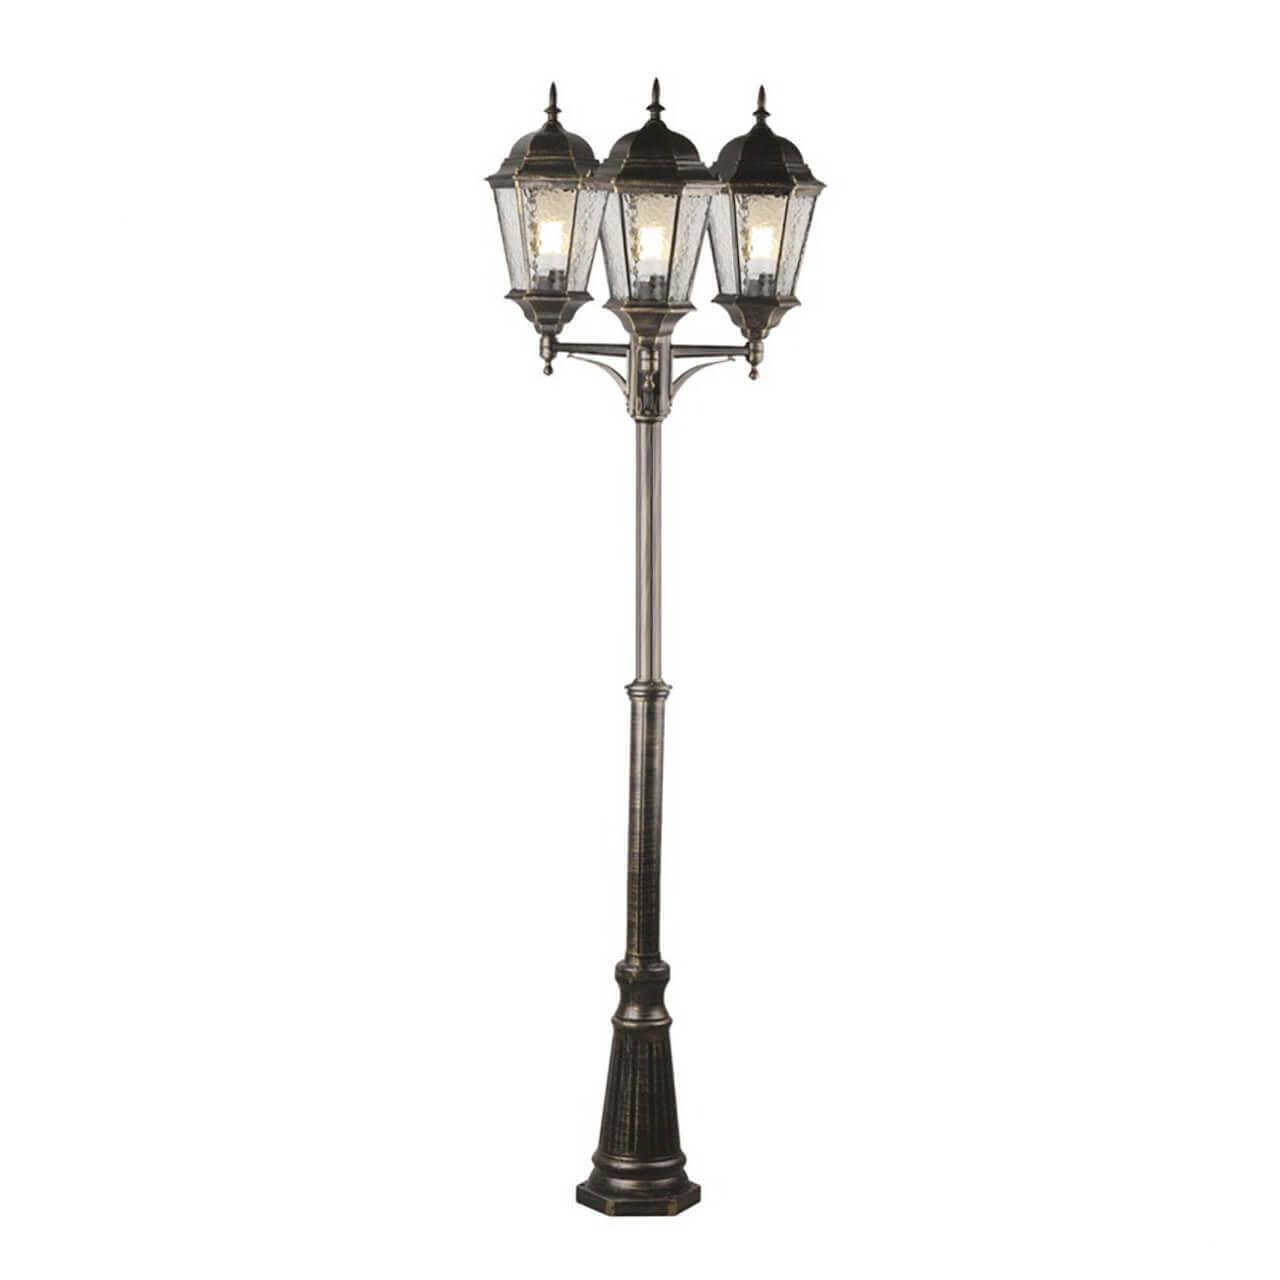 Садово-парковый светильник Arte Lamp Genova A1207PA-3BN садово парковый светильник arte lamp genova a1207pa 1bs